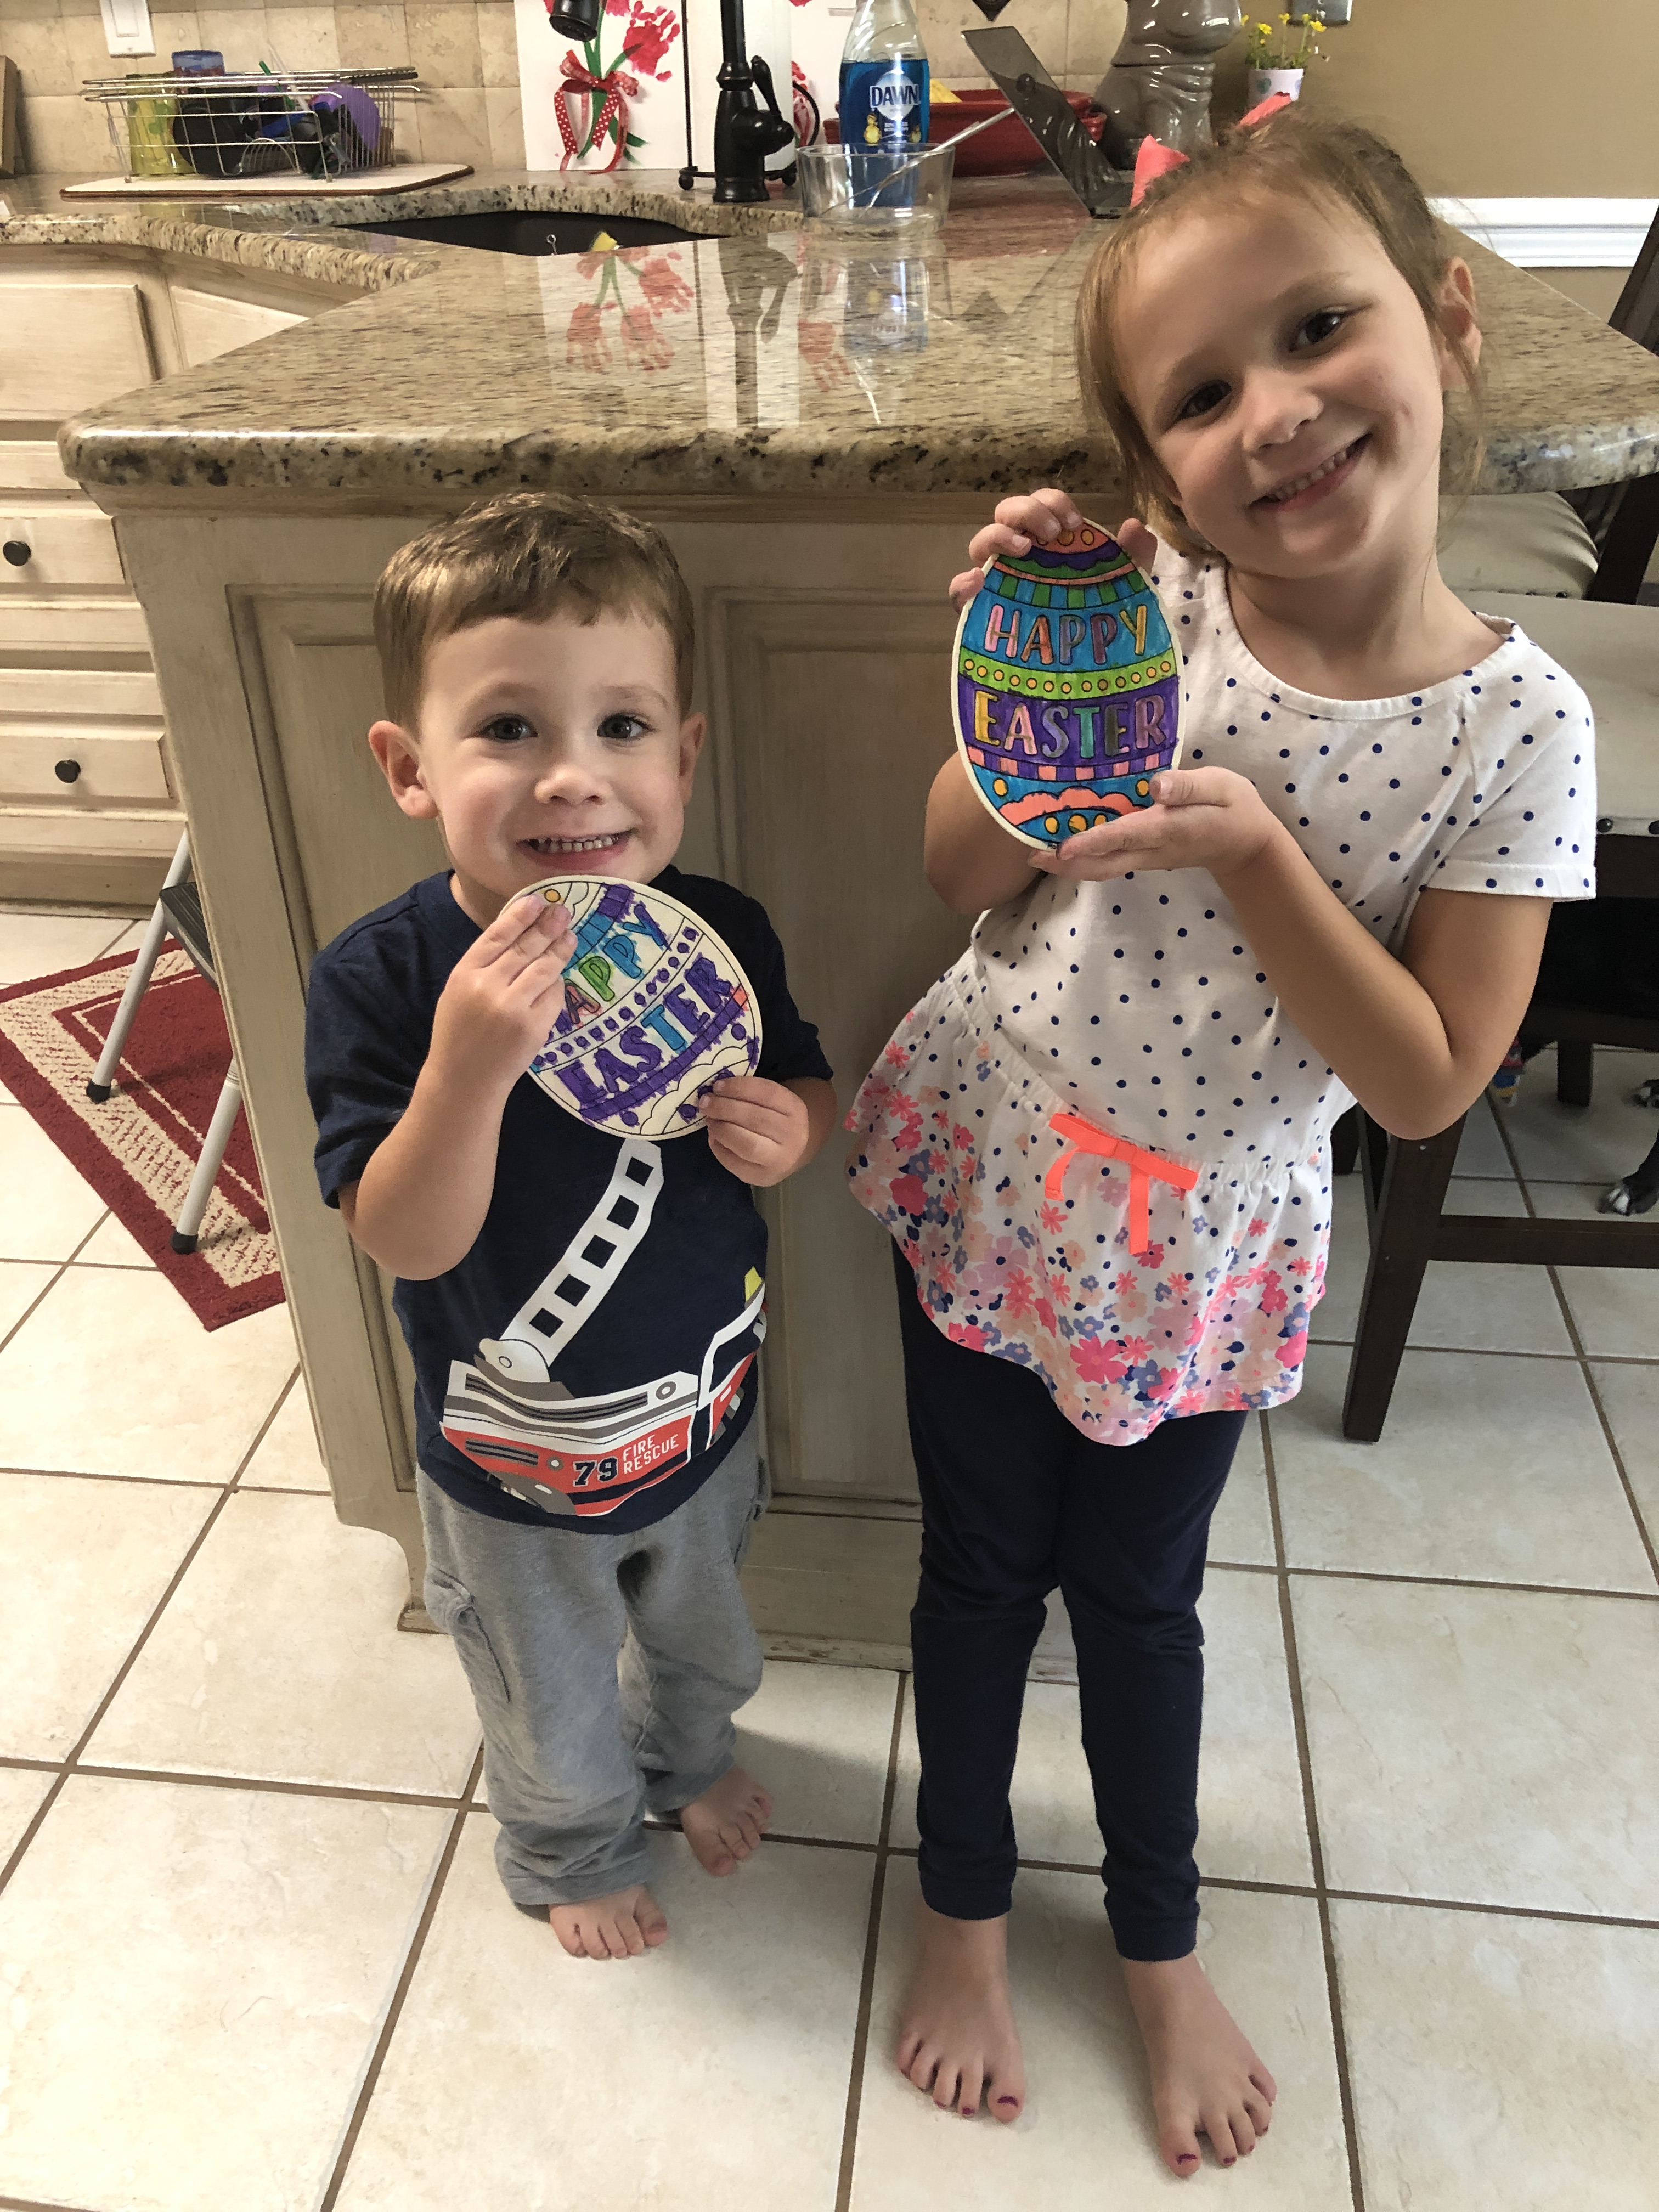 Eastercraft